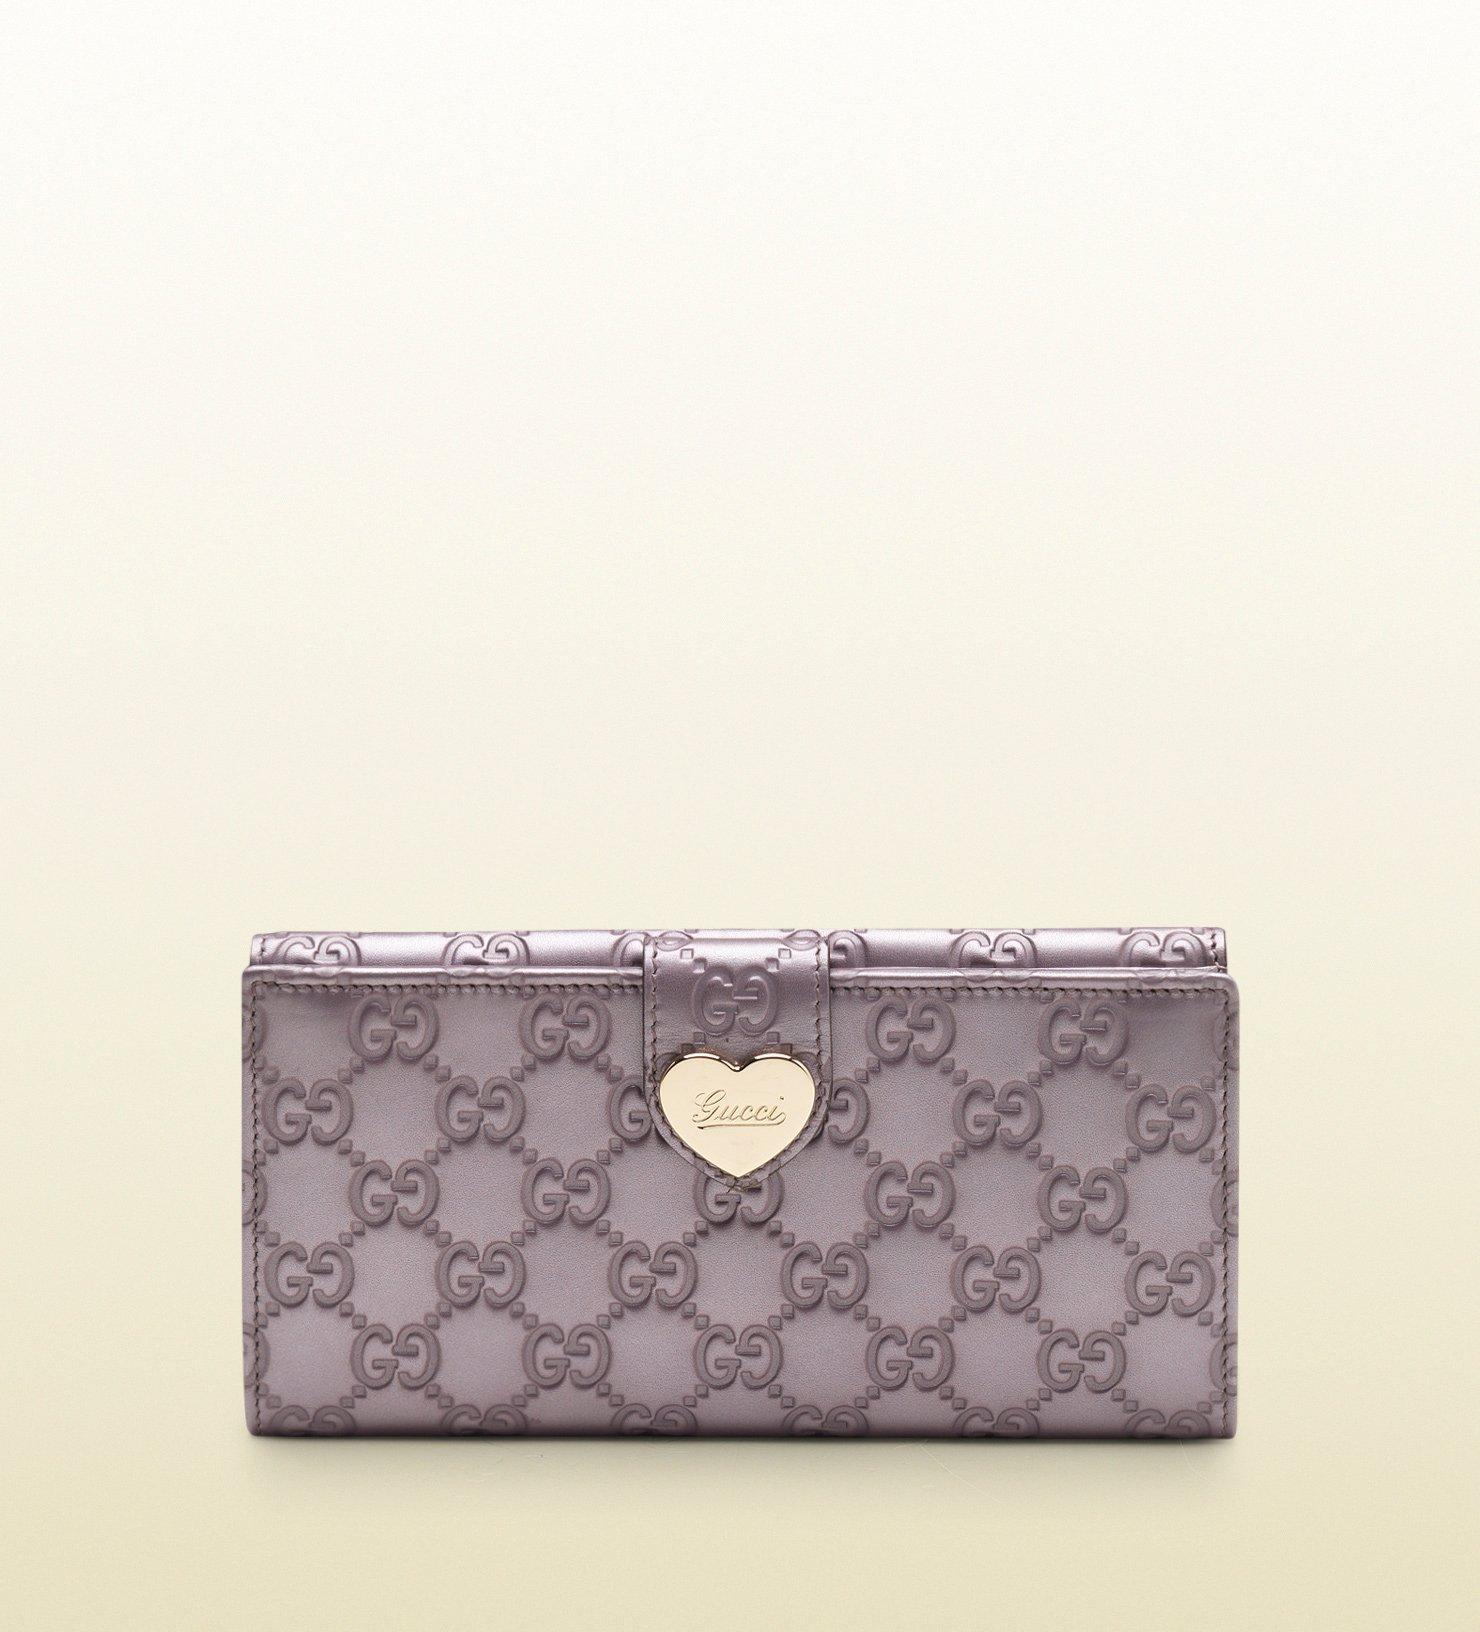 f436ff45412d Gucci Lilac Metallic Guccissima Leather Continental Wallet in Purple ...